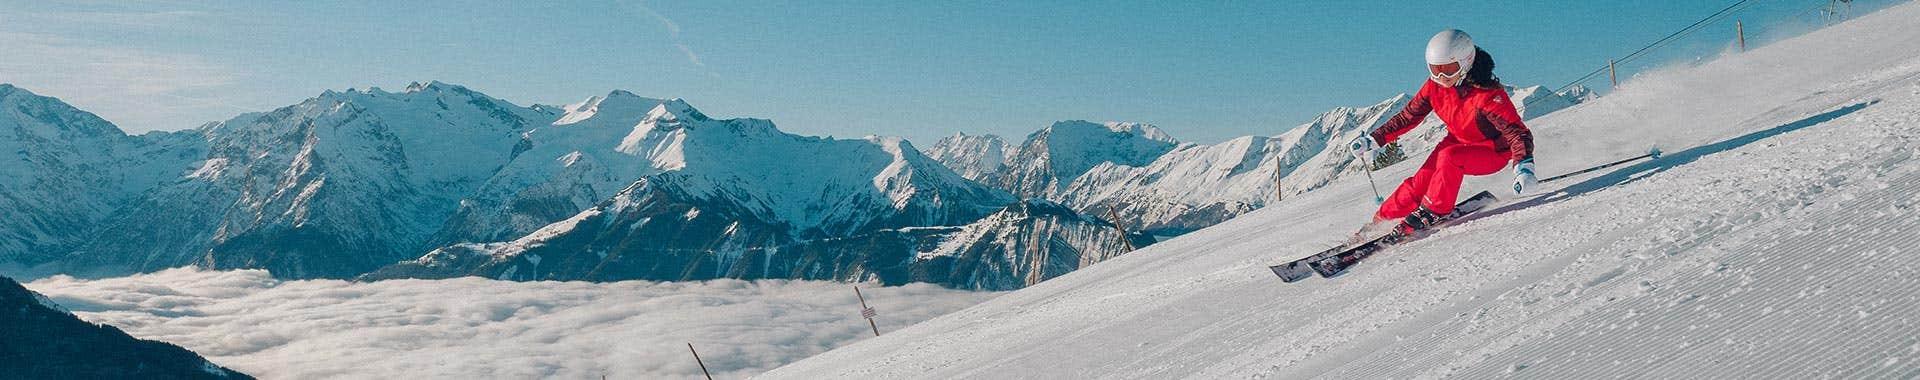 On piste ski boots